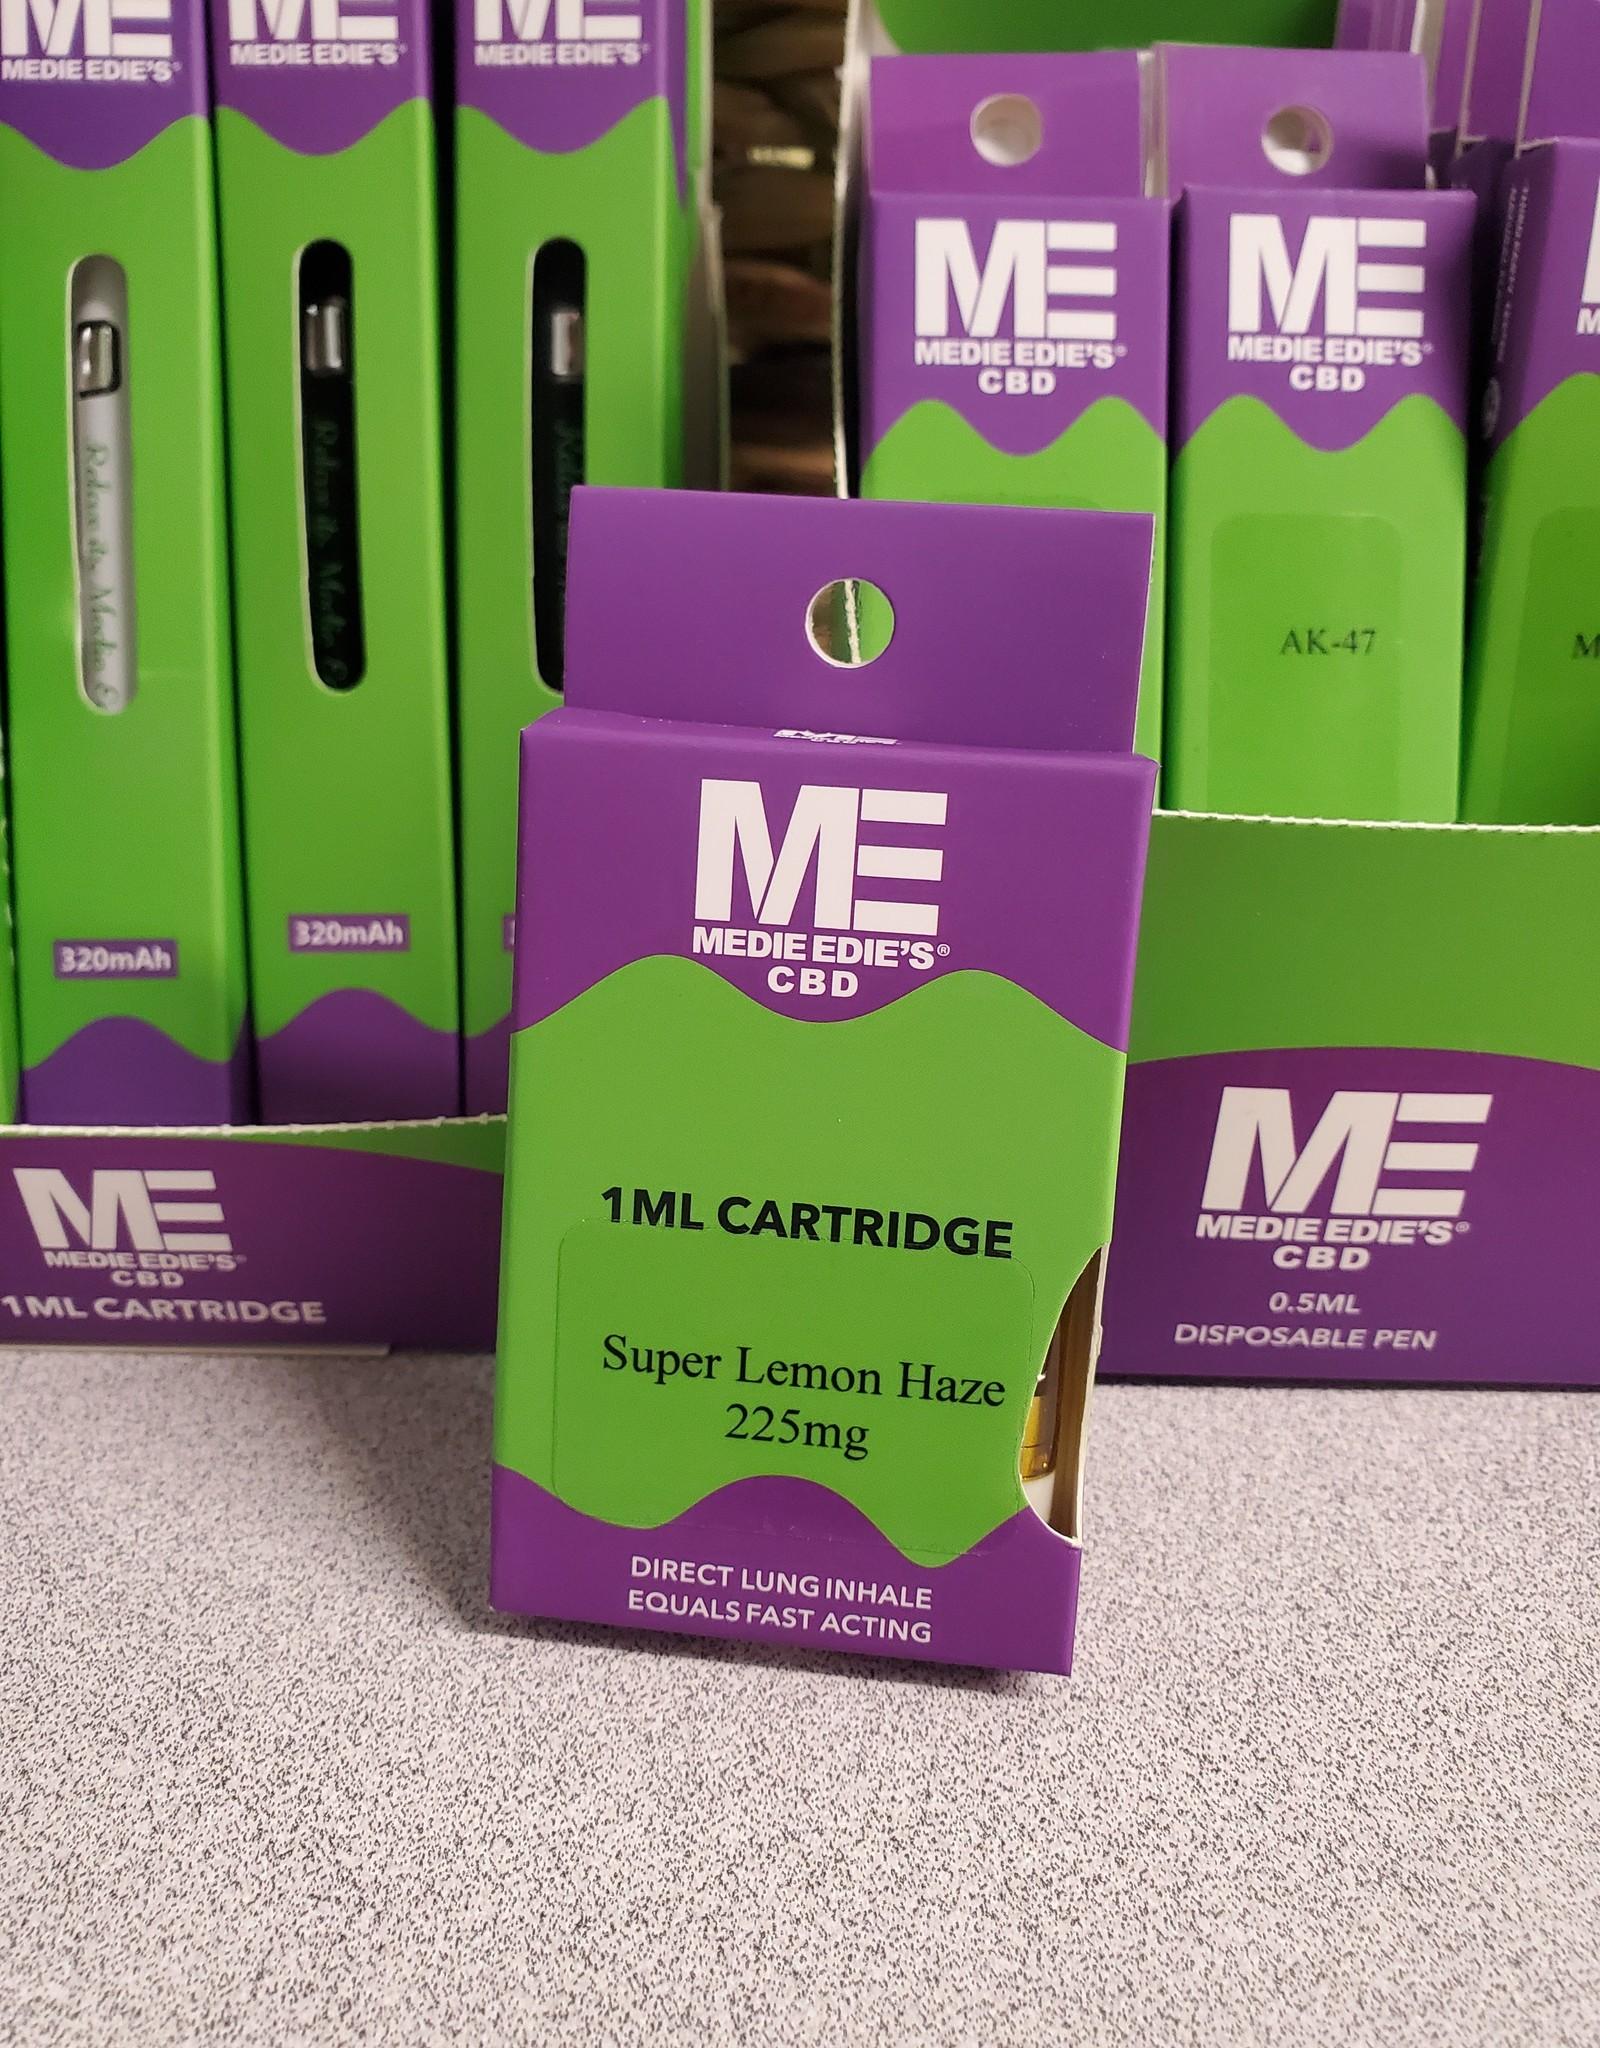 Medie Edie's Super Lemon Haze CBD Vape Cartridge - 225mg - 1ml